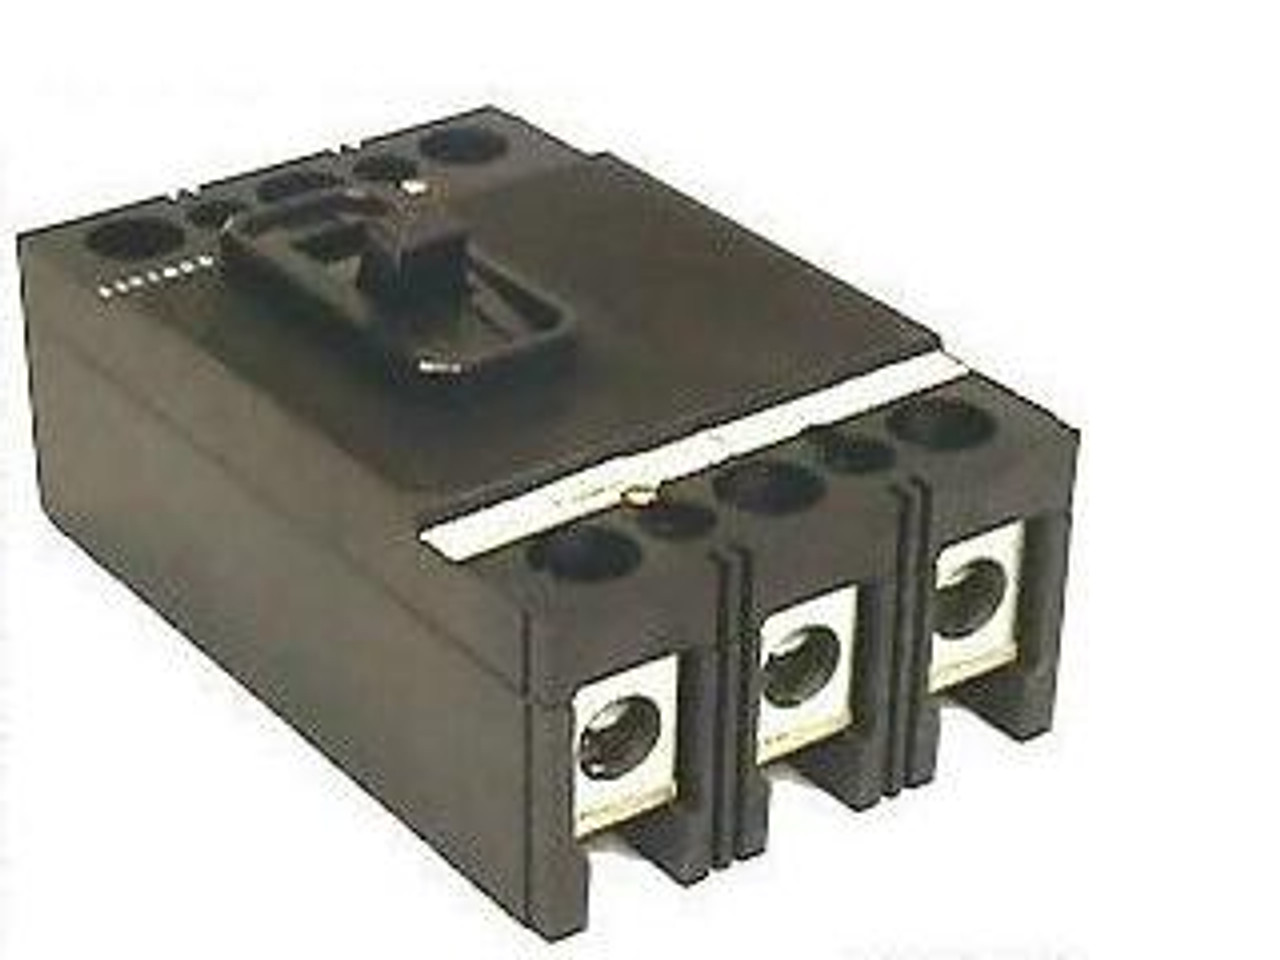 Siemens QJ22B125 2 Pole 125 Amps 240VAC MC Circuit Breaker - Used